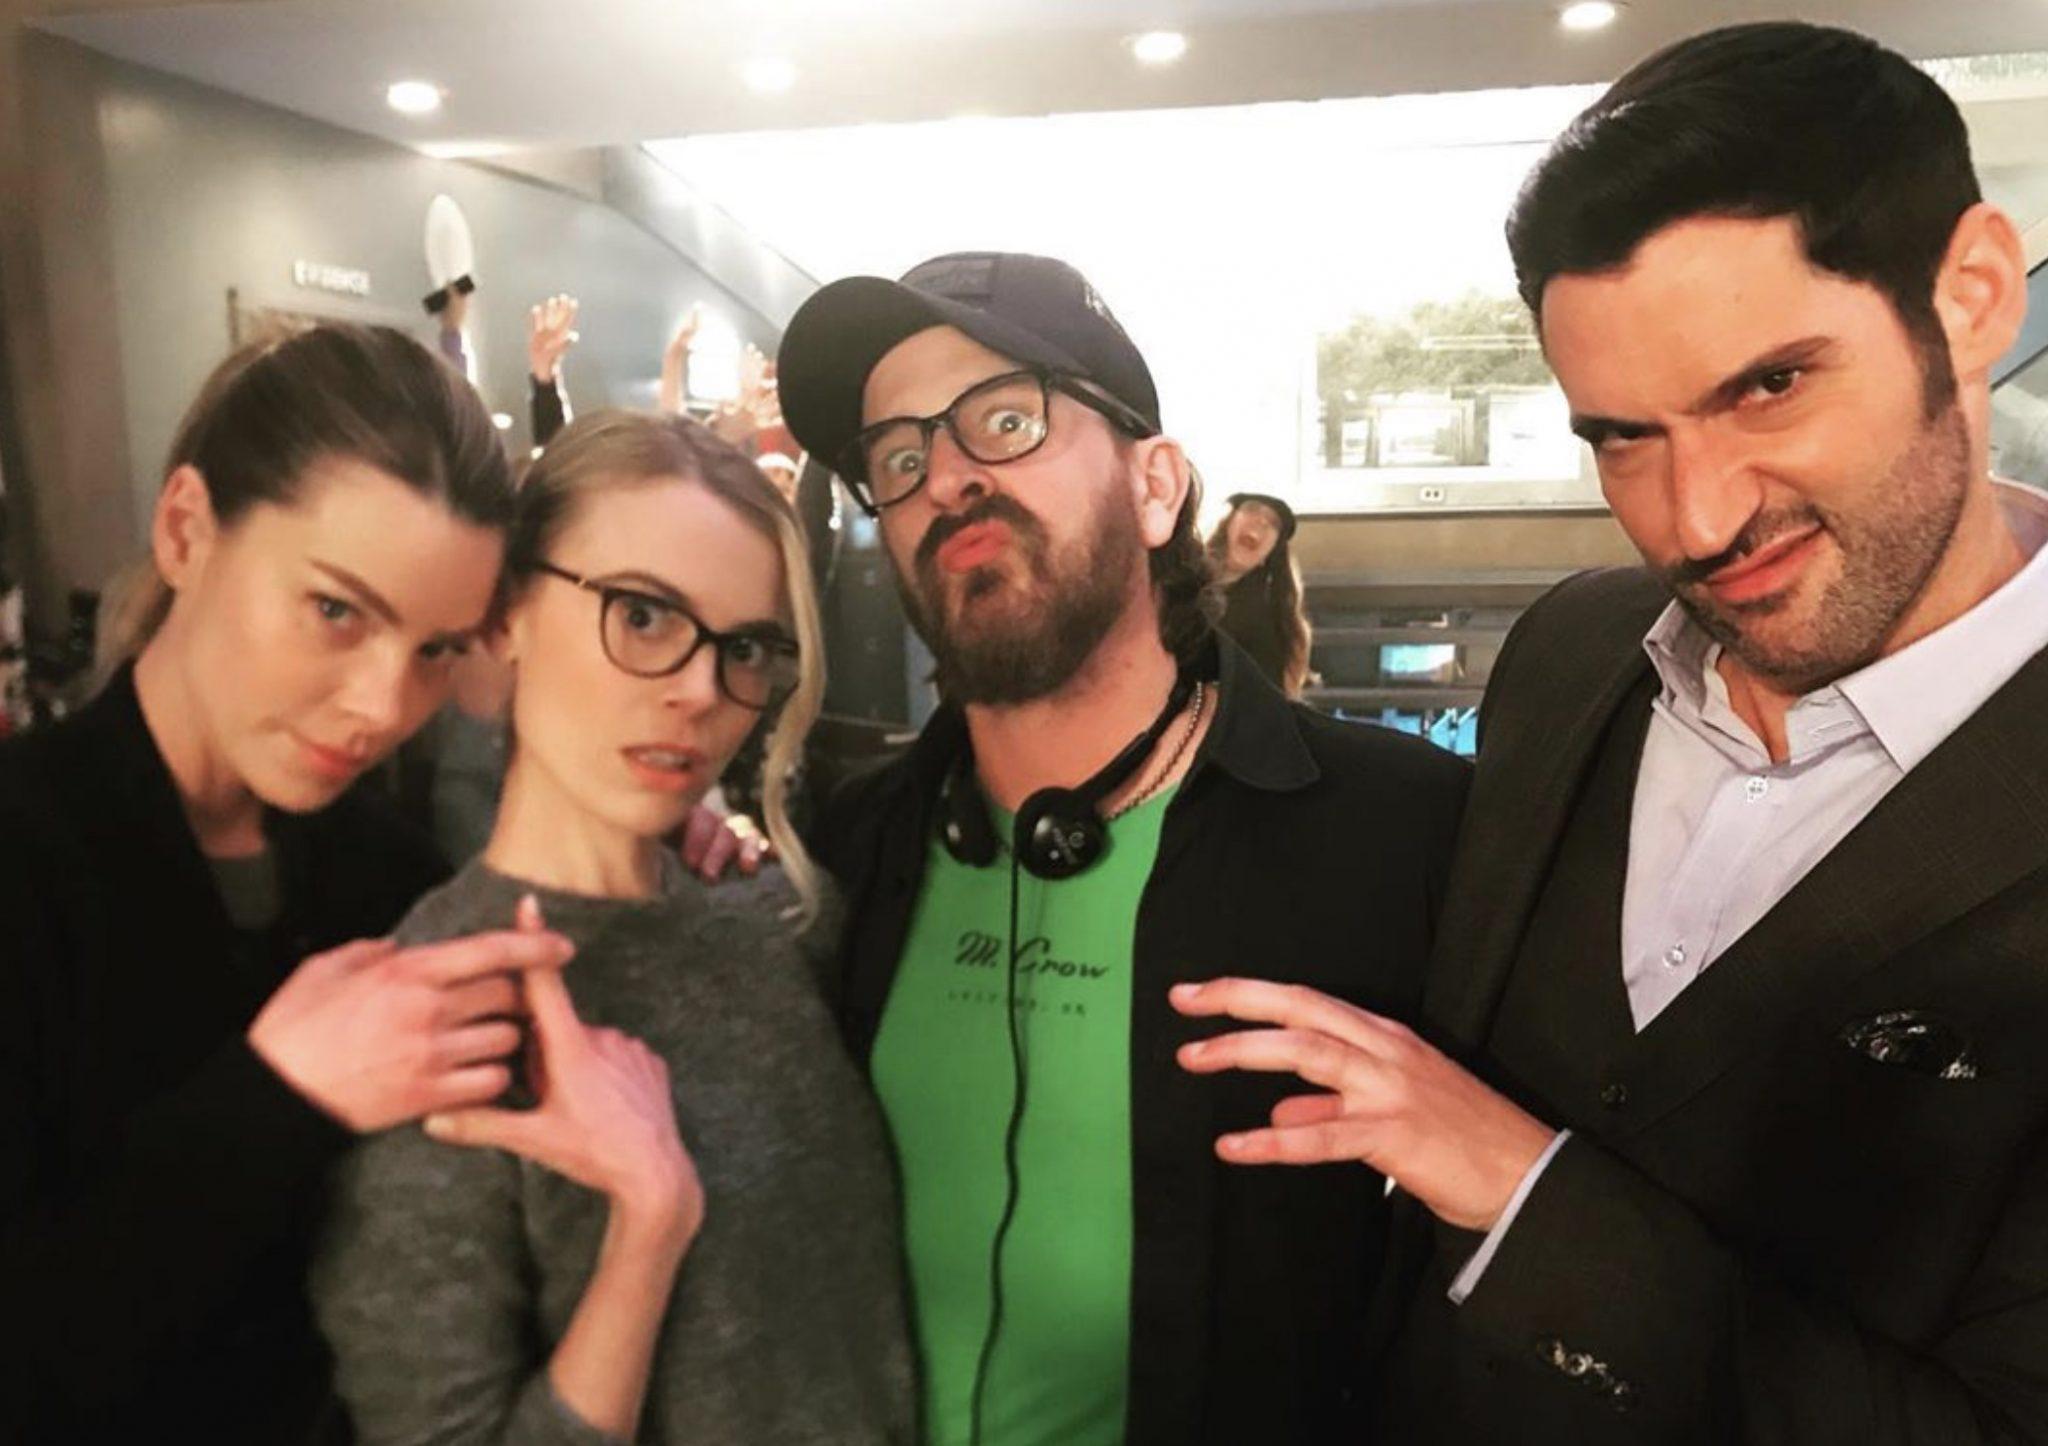 Lauren German, Tom Ellis, Lucifer-https://www.instagram.com/p/B8jlz8CpYA4/